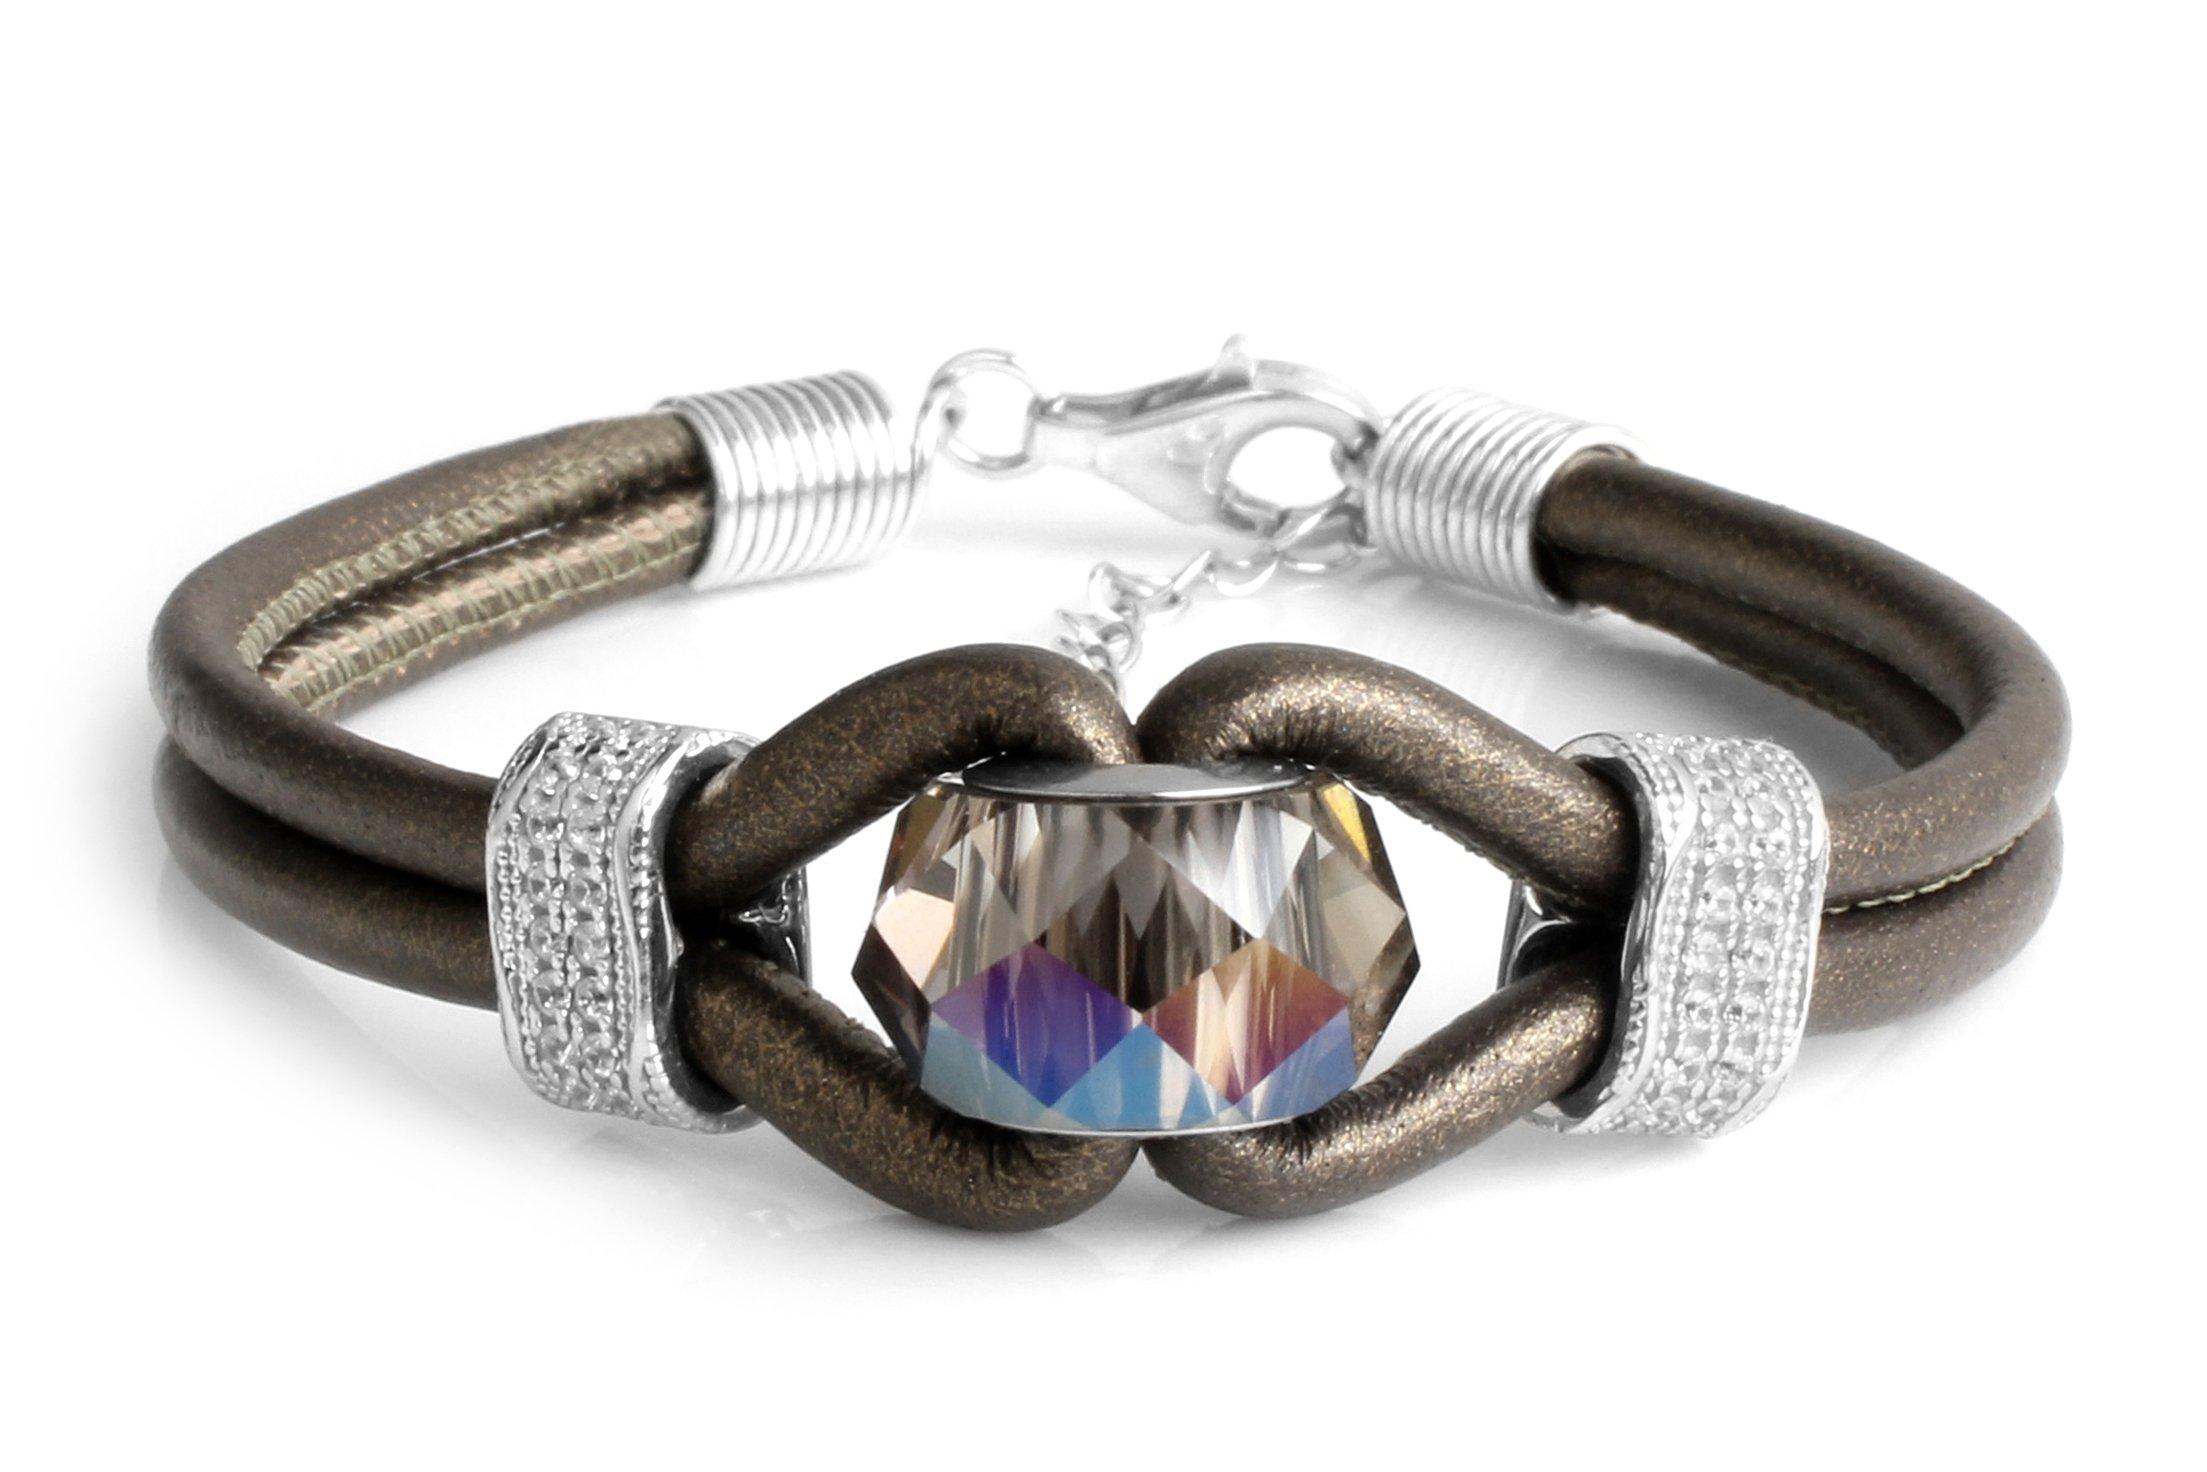 Bracelets Swarovski Genuine Leather 3mm 2Line Womens Find Your Fit Round Z2661 (15 Centimeters)